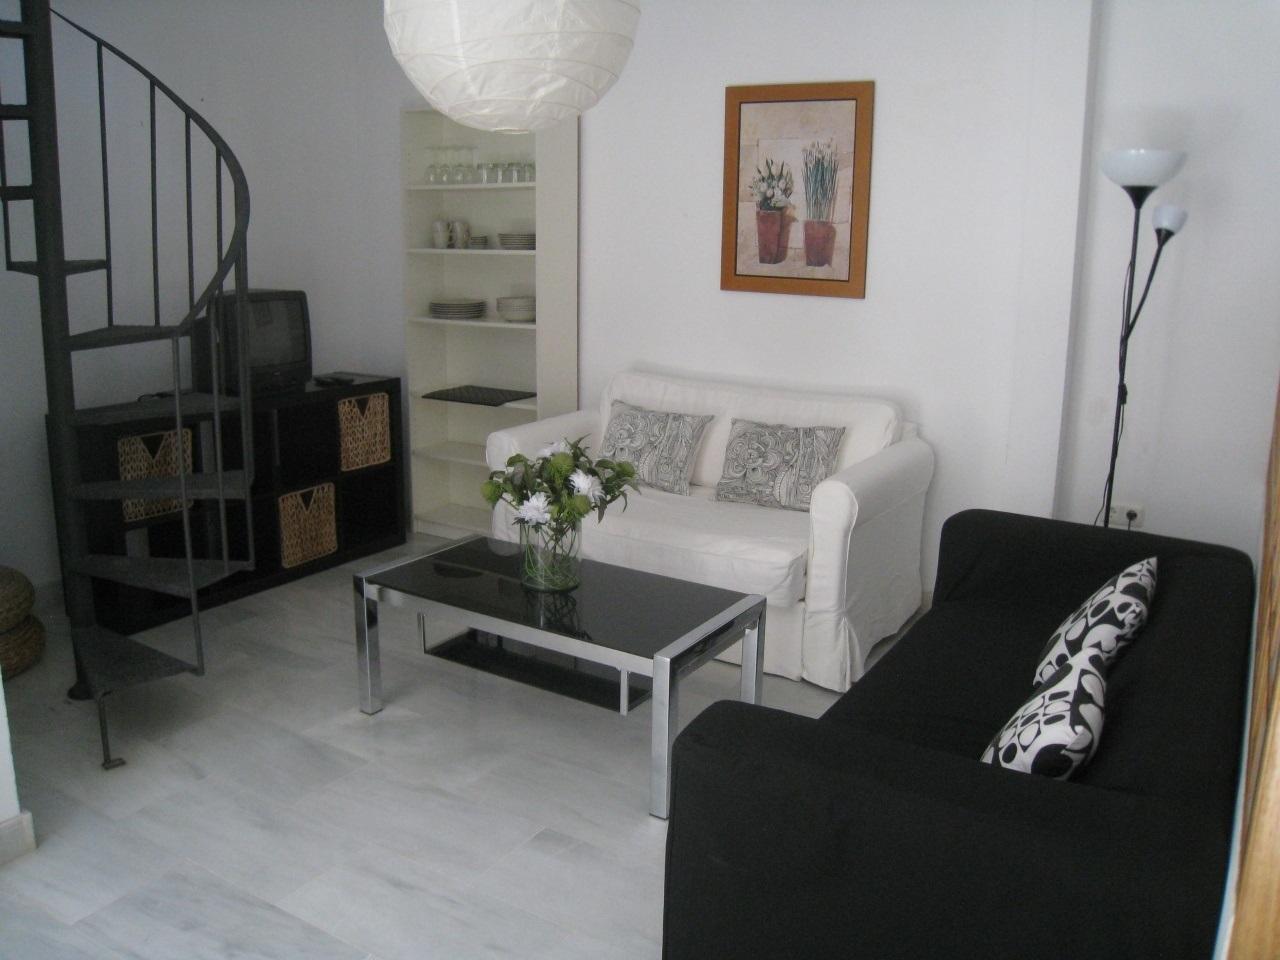 2 Bed Short Term Rental Accommodation Malaga City